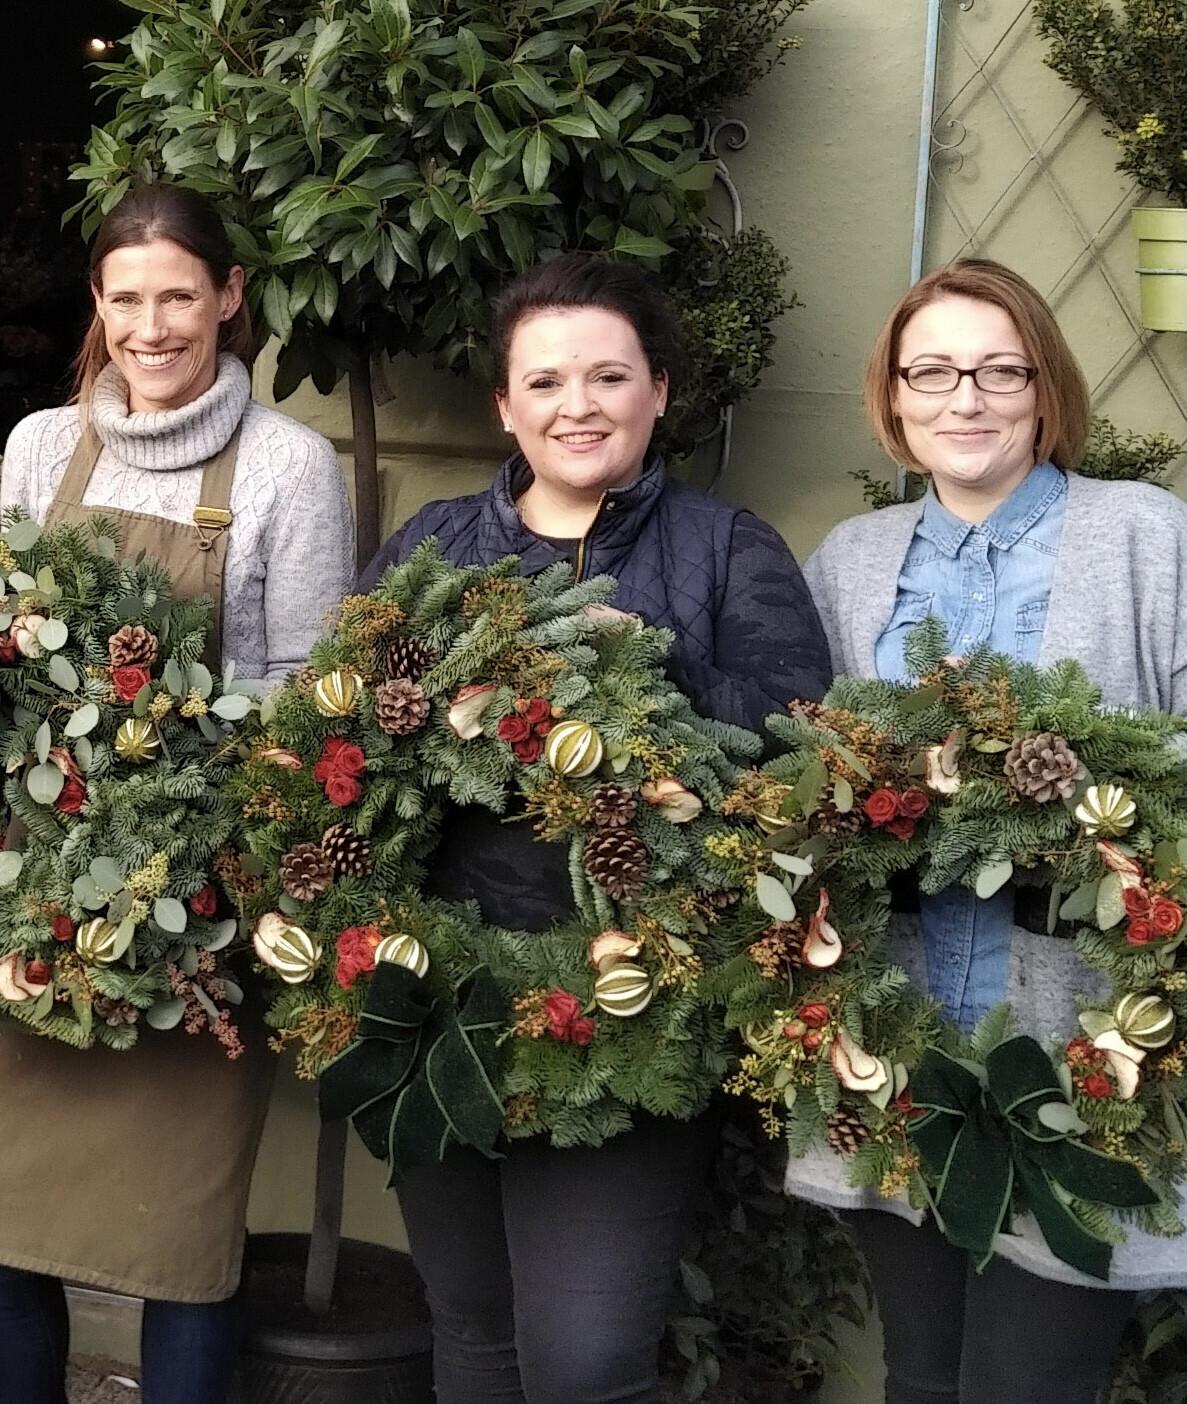 Wreath Making - Fri 4th Dec 2020 2pm